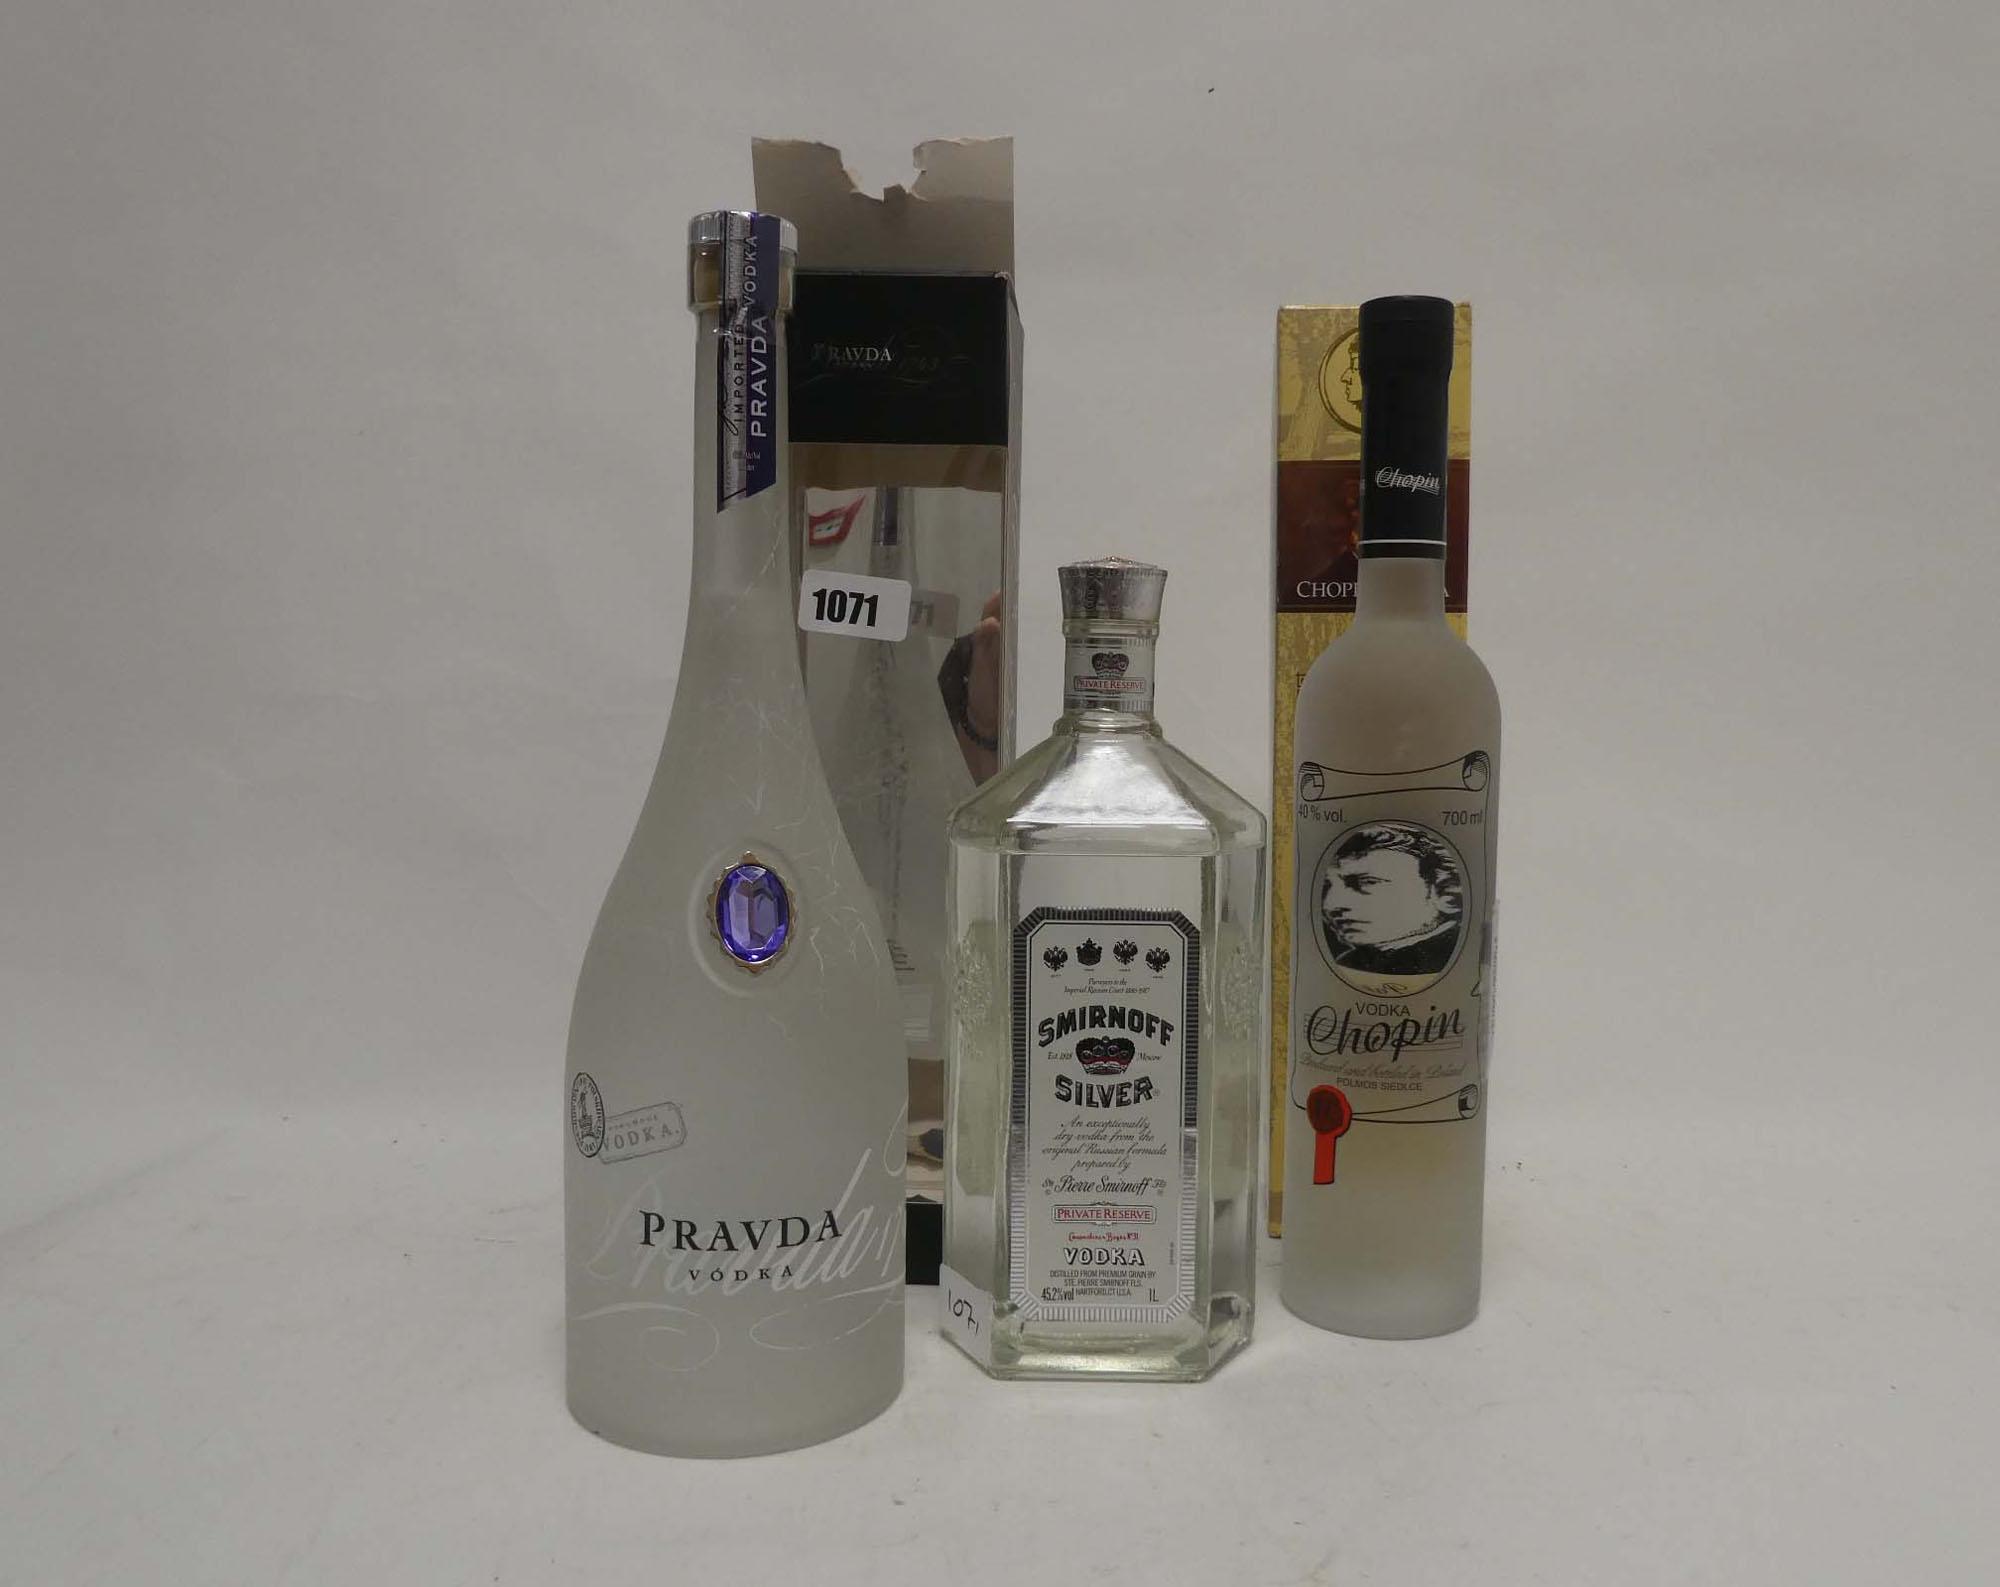 3 bottles of Vodka, 1x Pravda Polish Imported Vodka with box 1litre 40%,